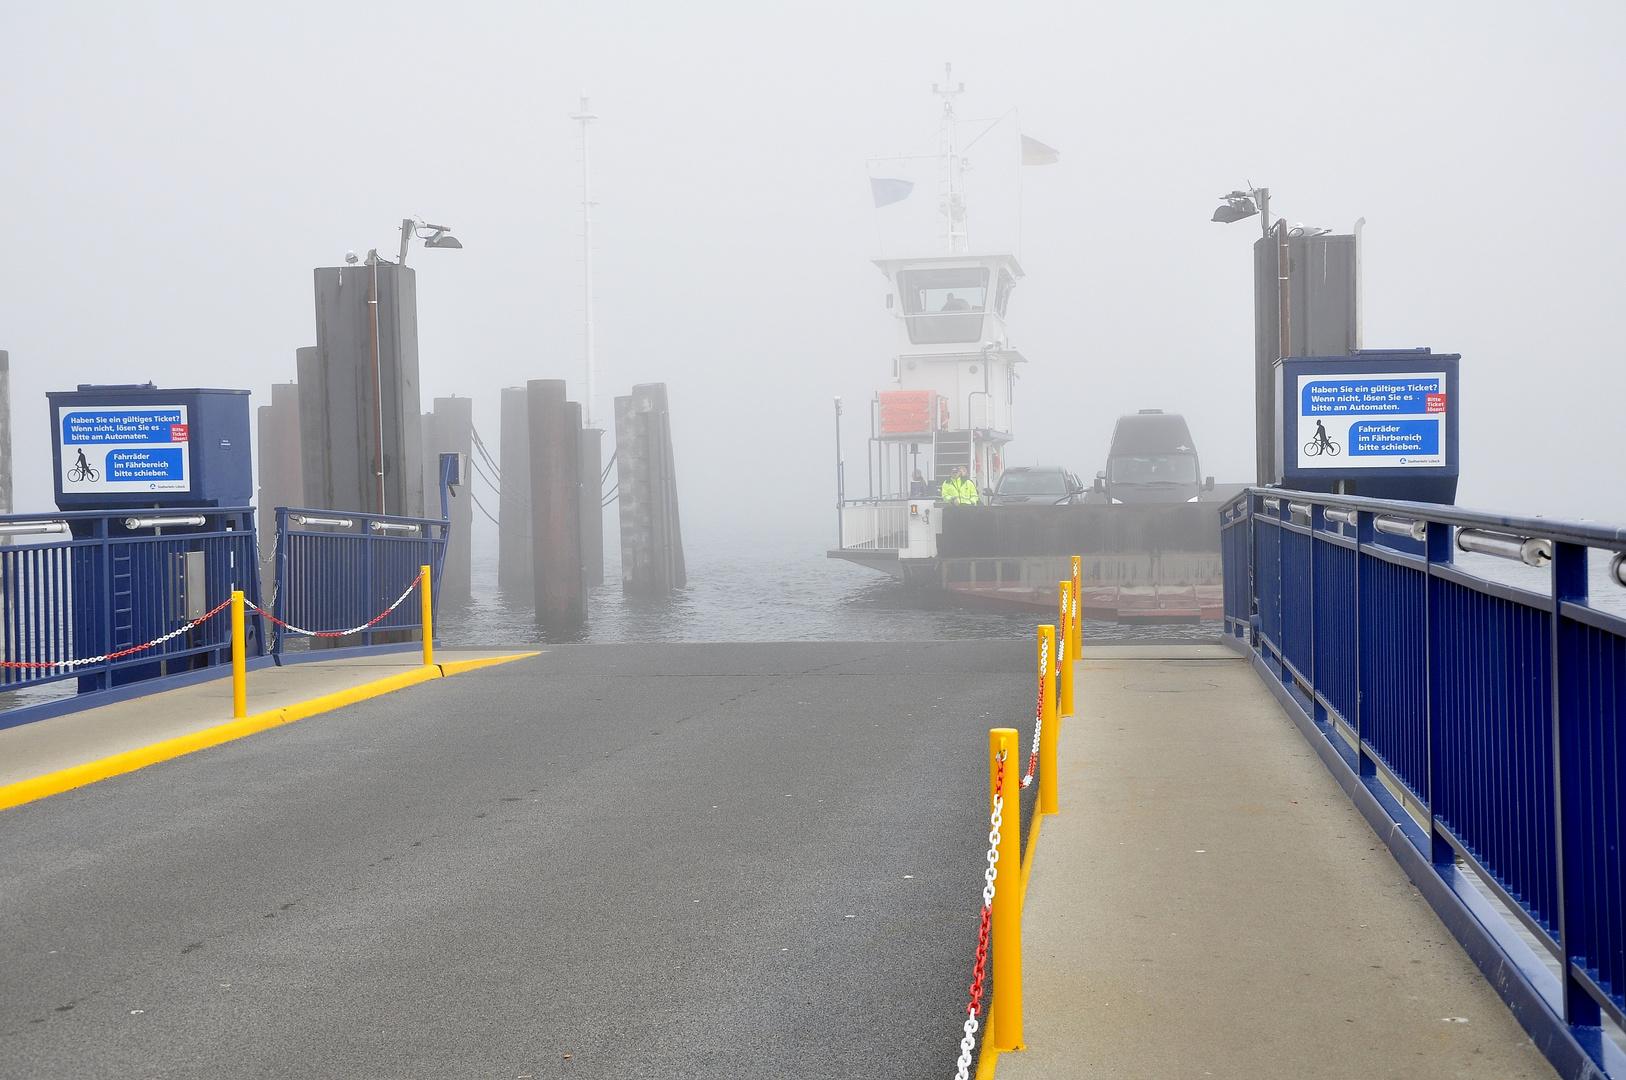 Priwallfähre im Nebel  3